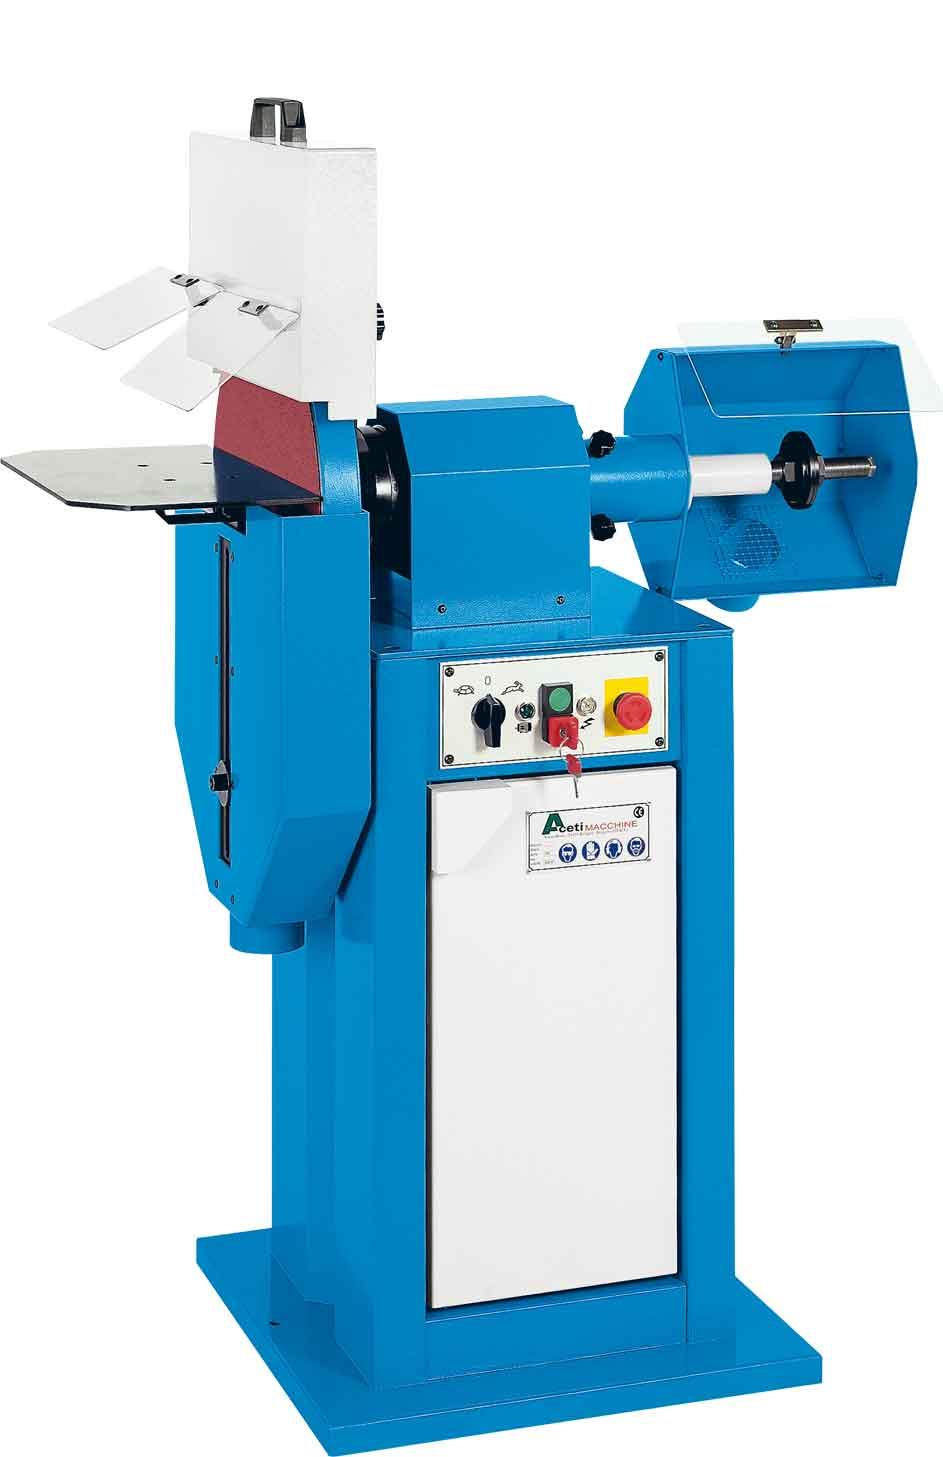 ART.26 - Disc grinding machine